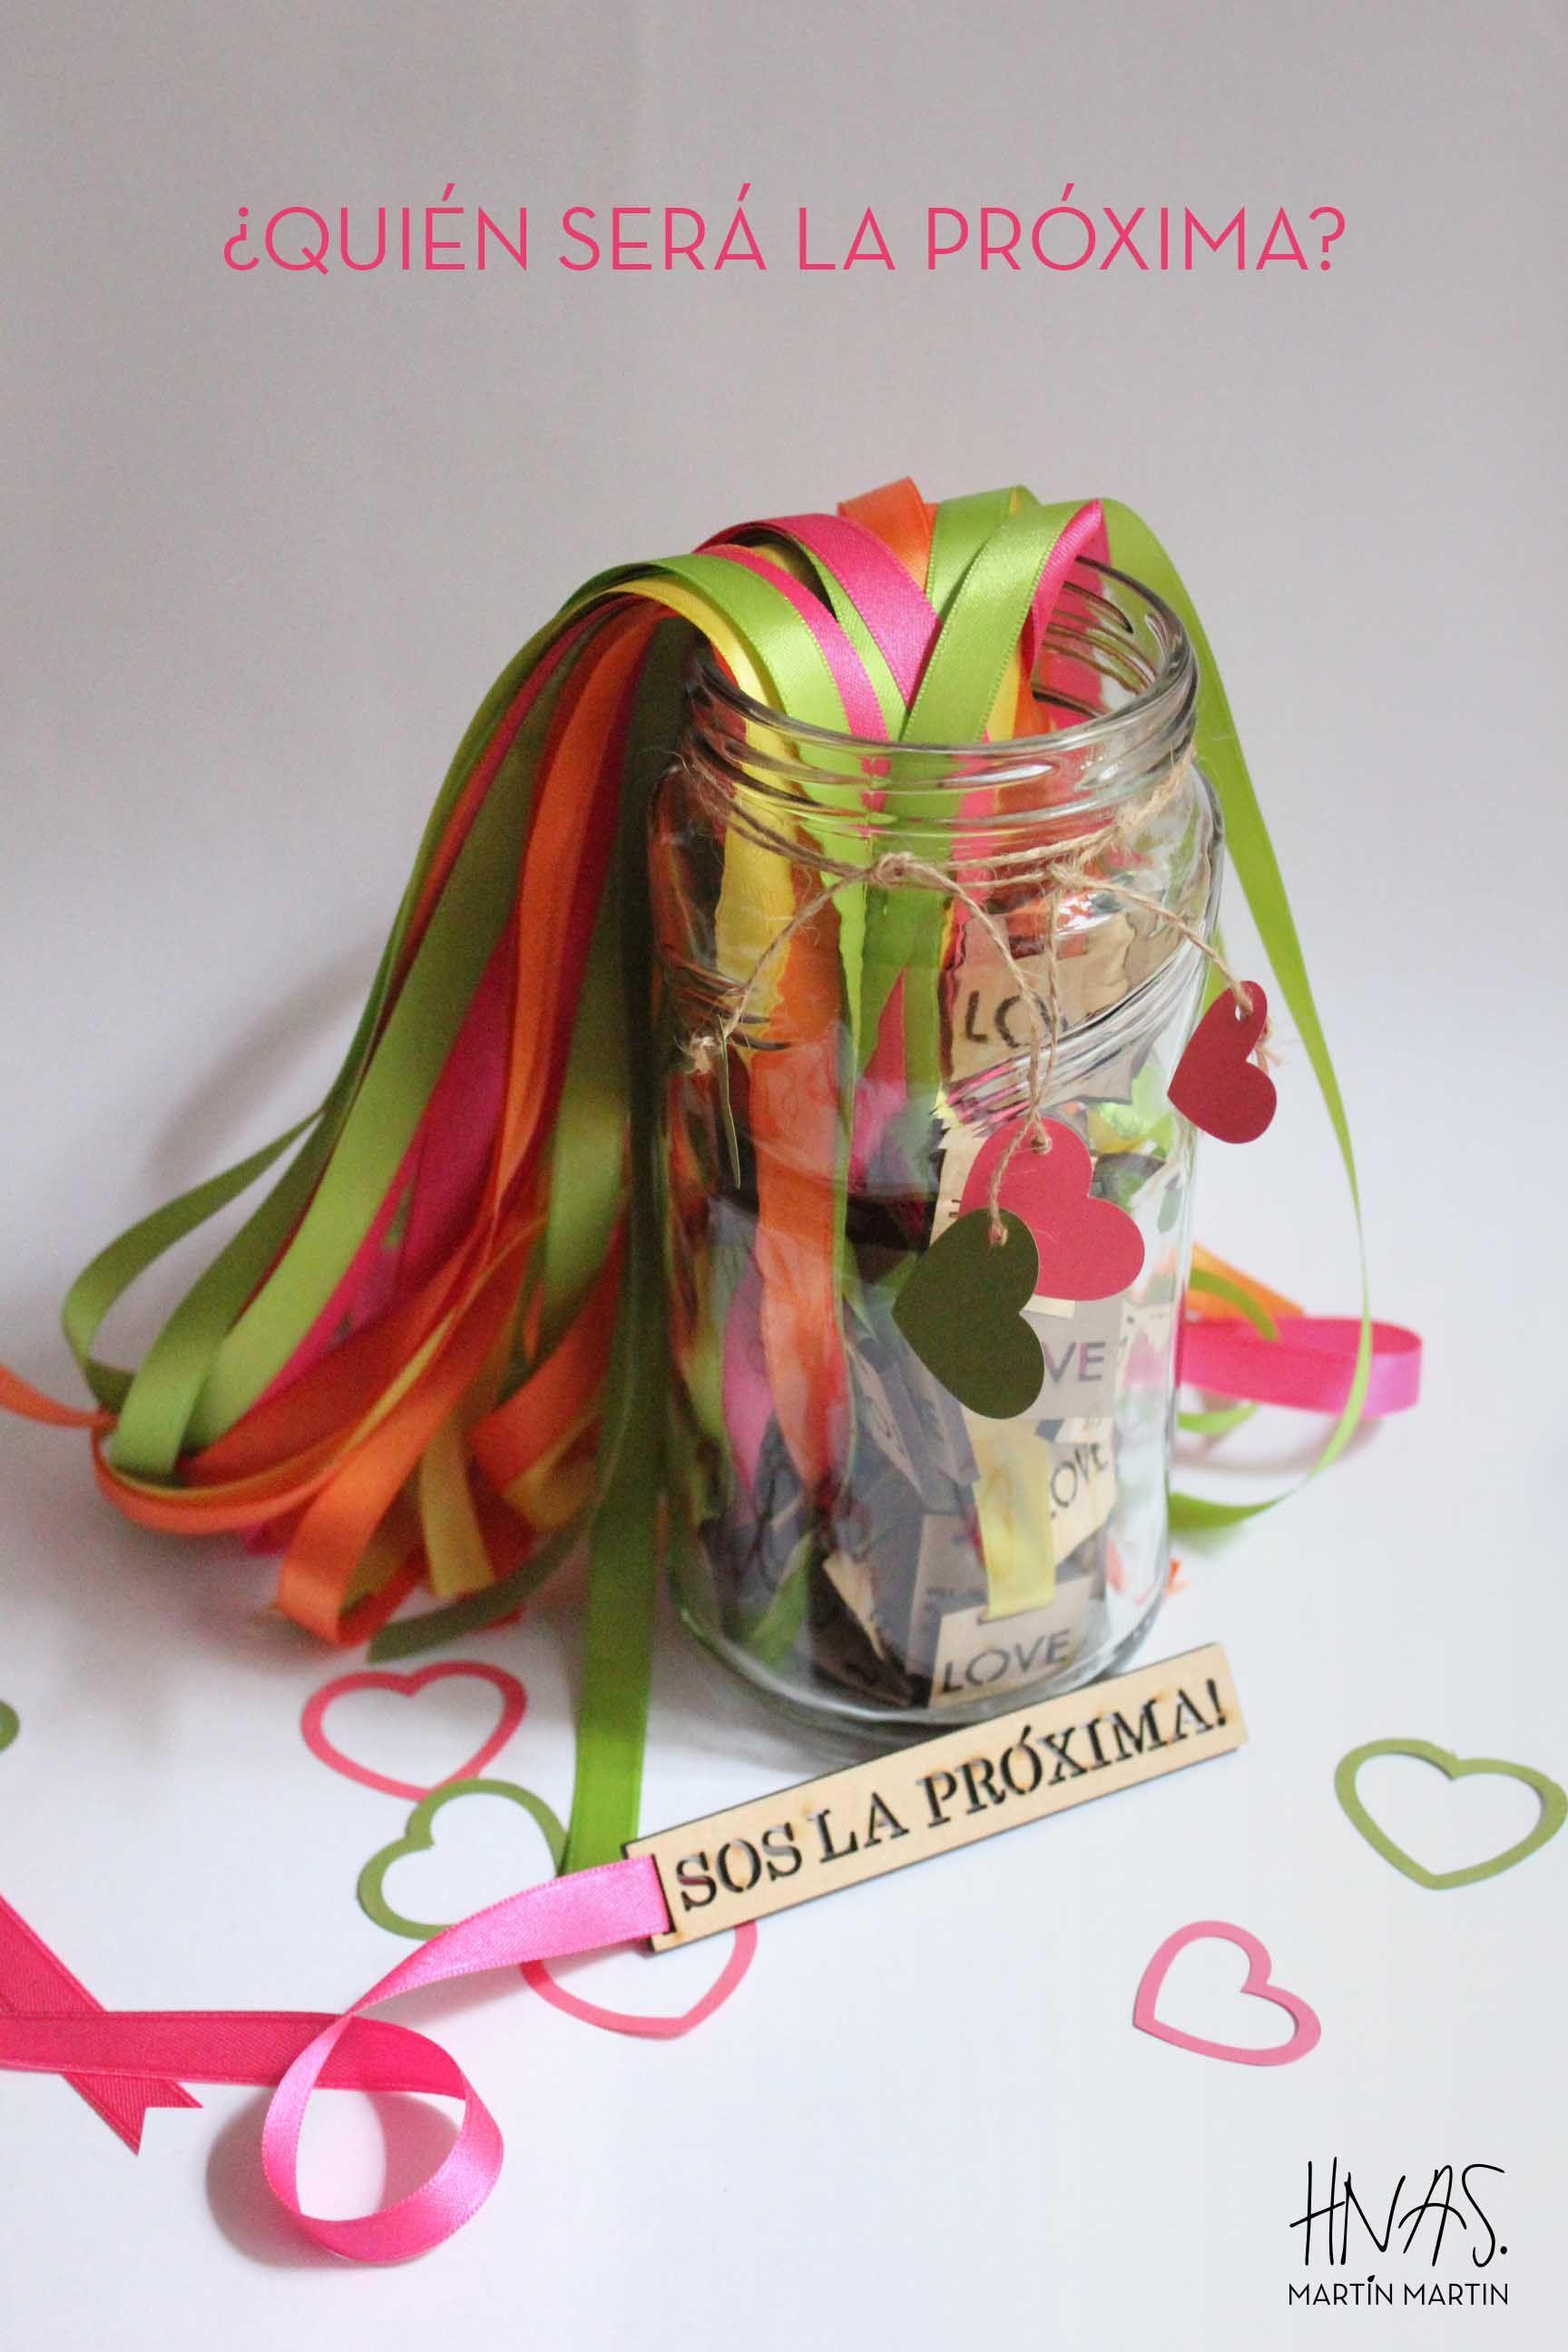 Cintitas Para Las Solteras Love Ring Despedida De Soltera Ideas Juegos Despedida De Soltera Juegos Boda